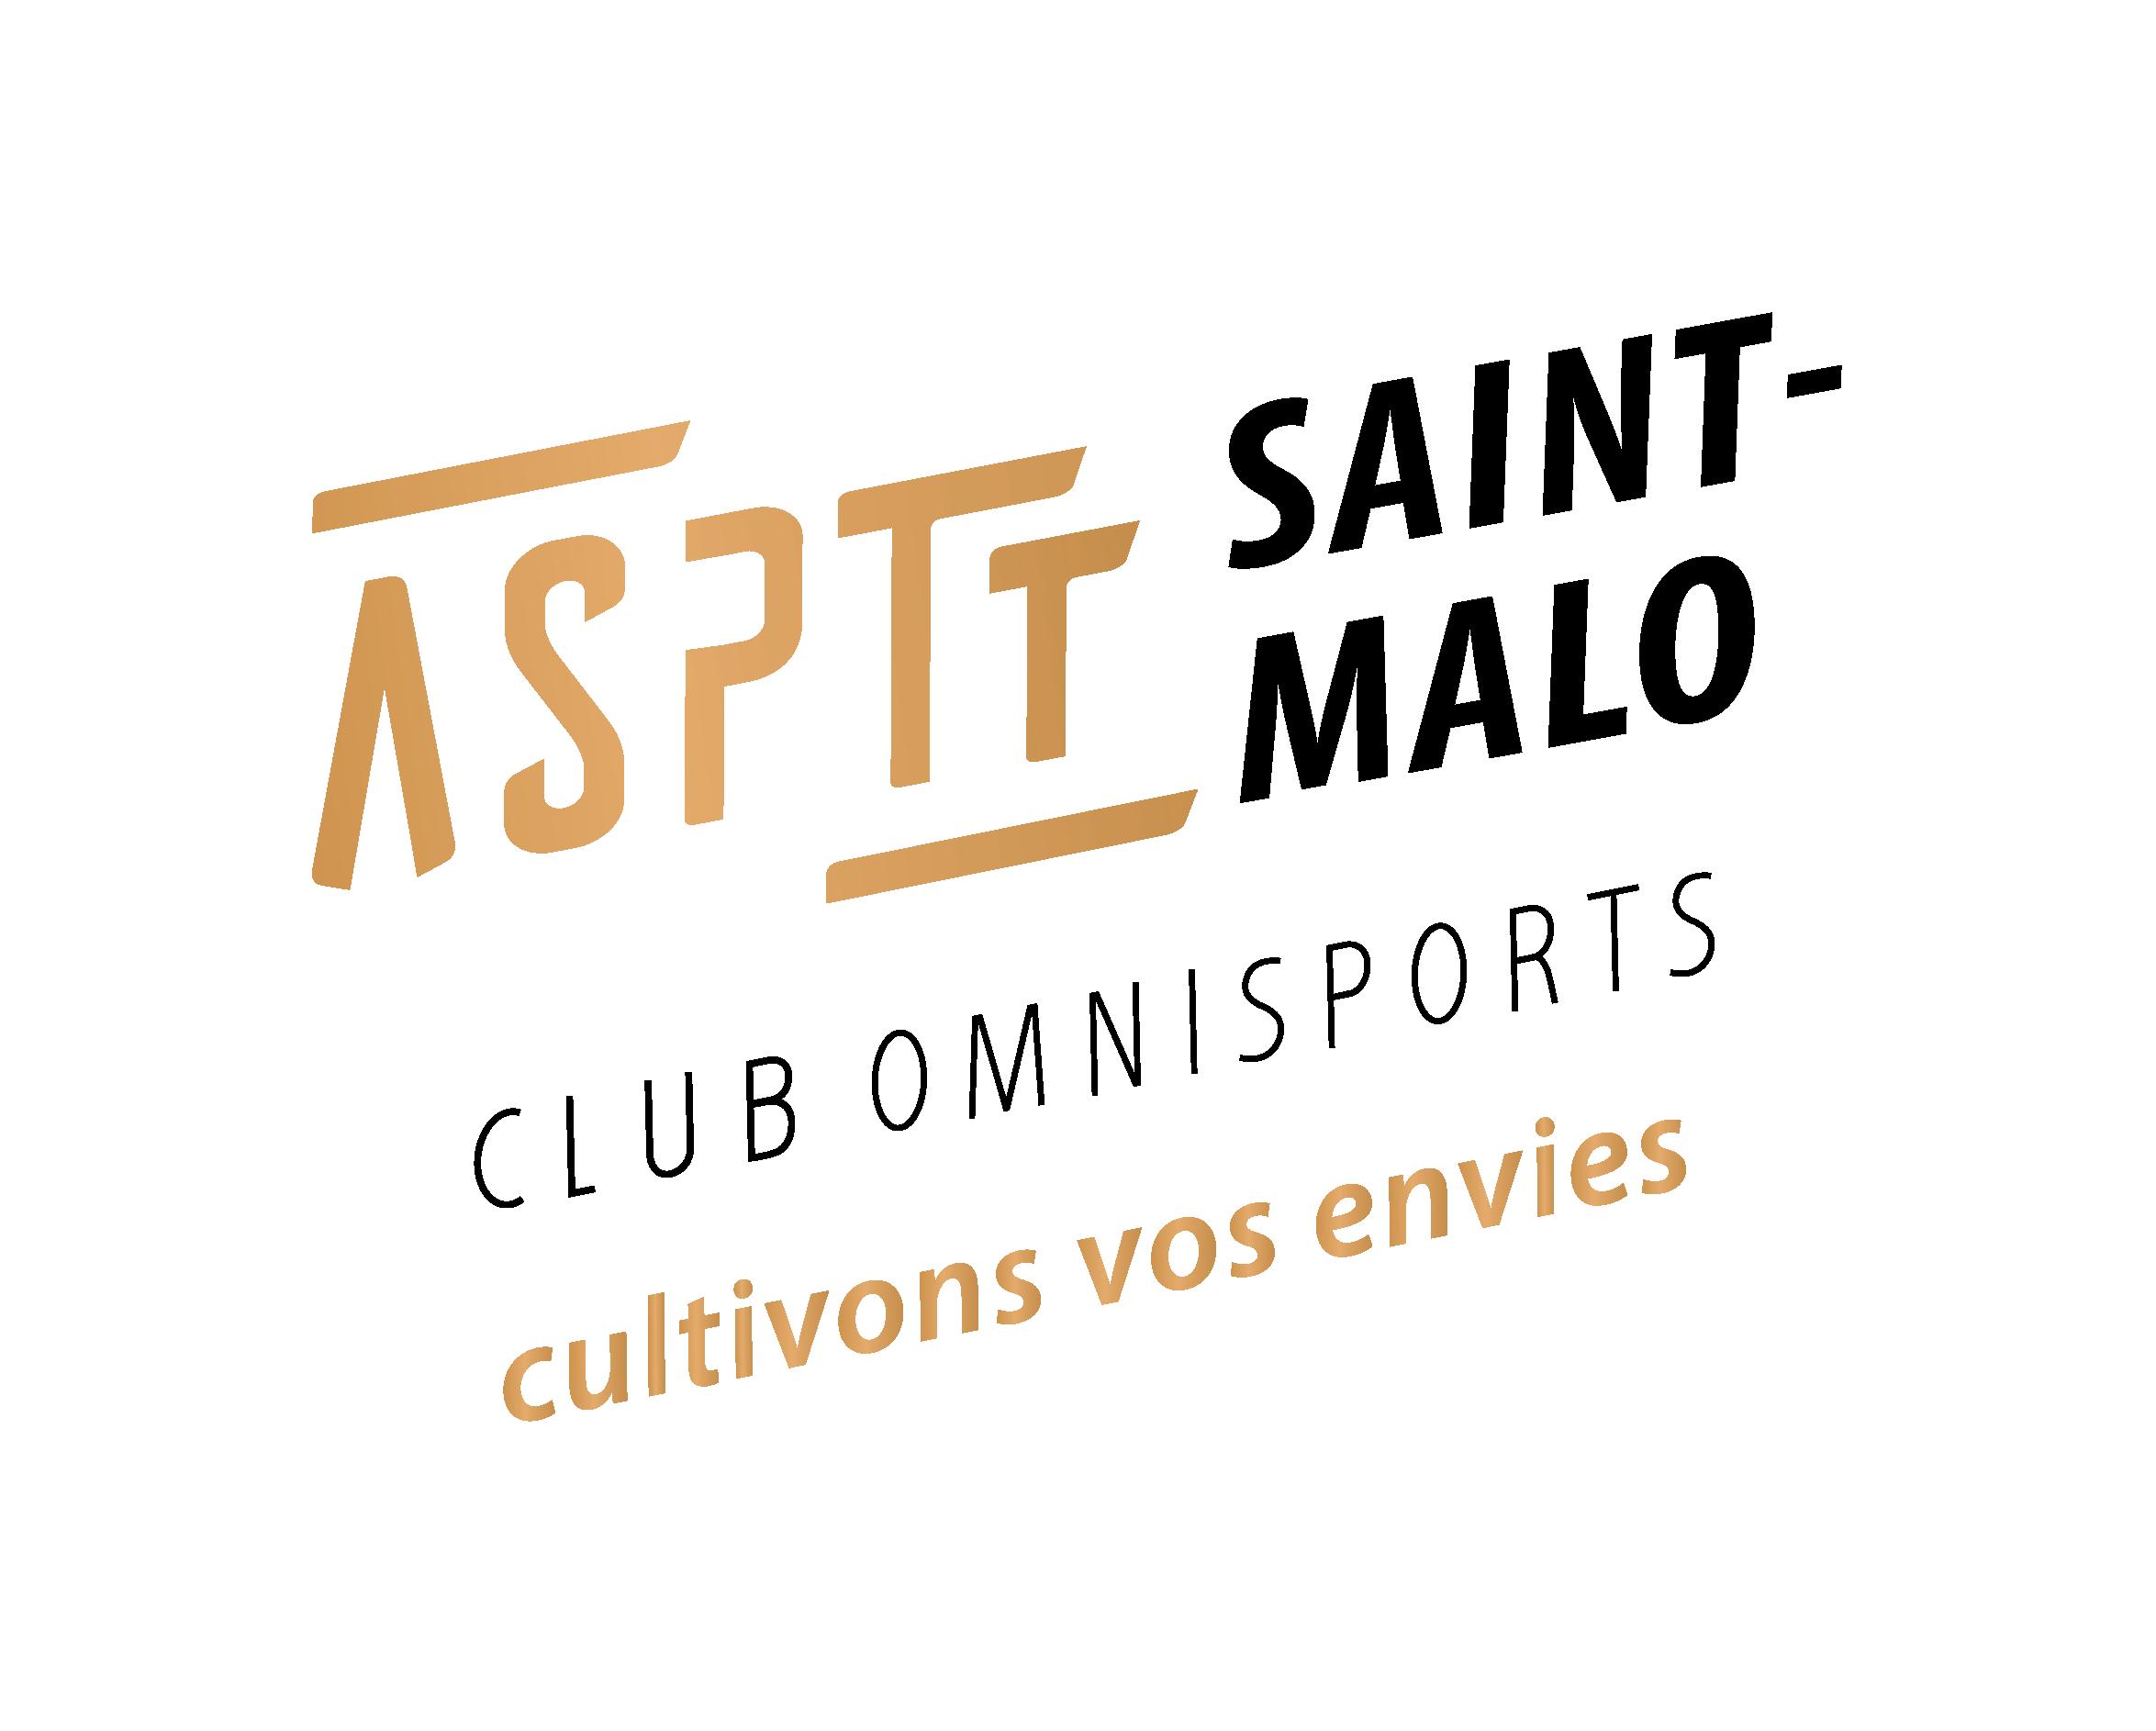 ASPTT Saint-Malo Club omnisports cultivons vos envies